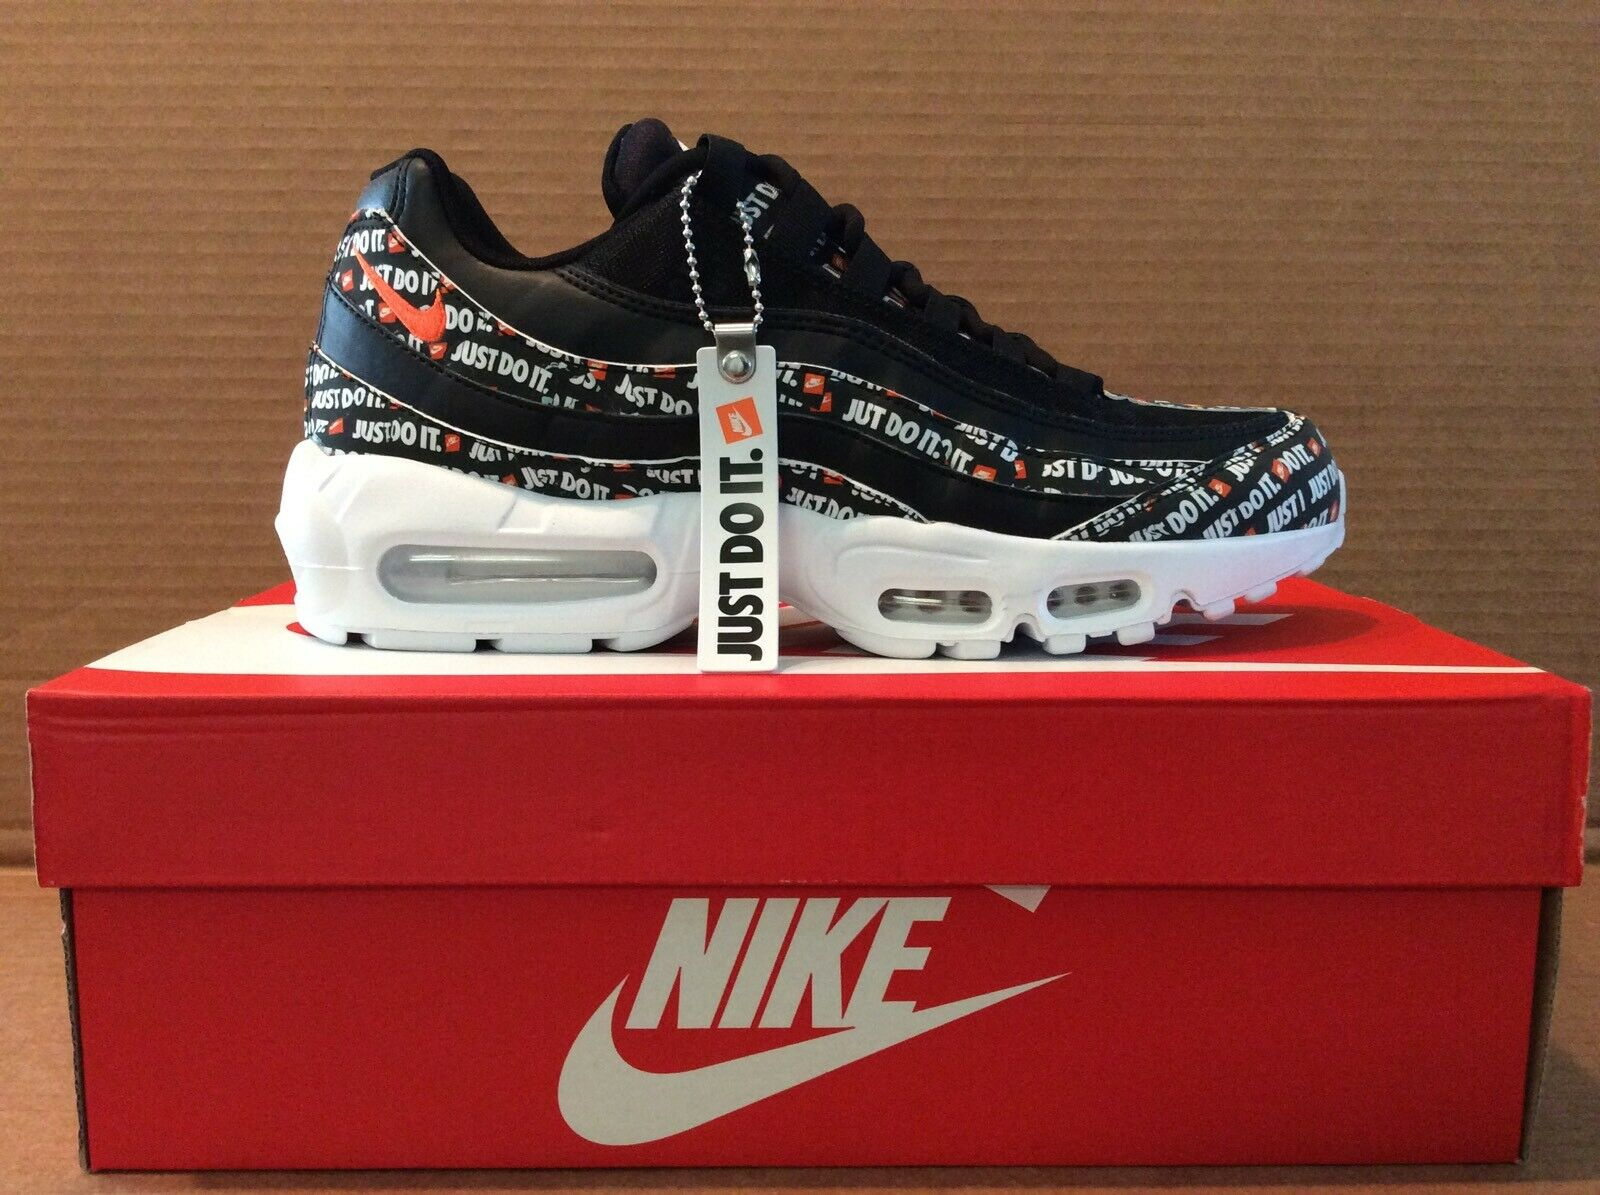 Nike Air Max 95 SE 'Just Do It' black orange size 9.5 mens 11 womens